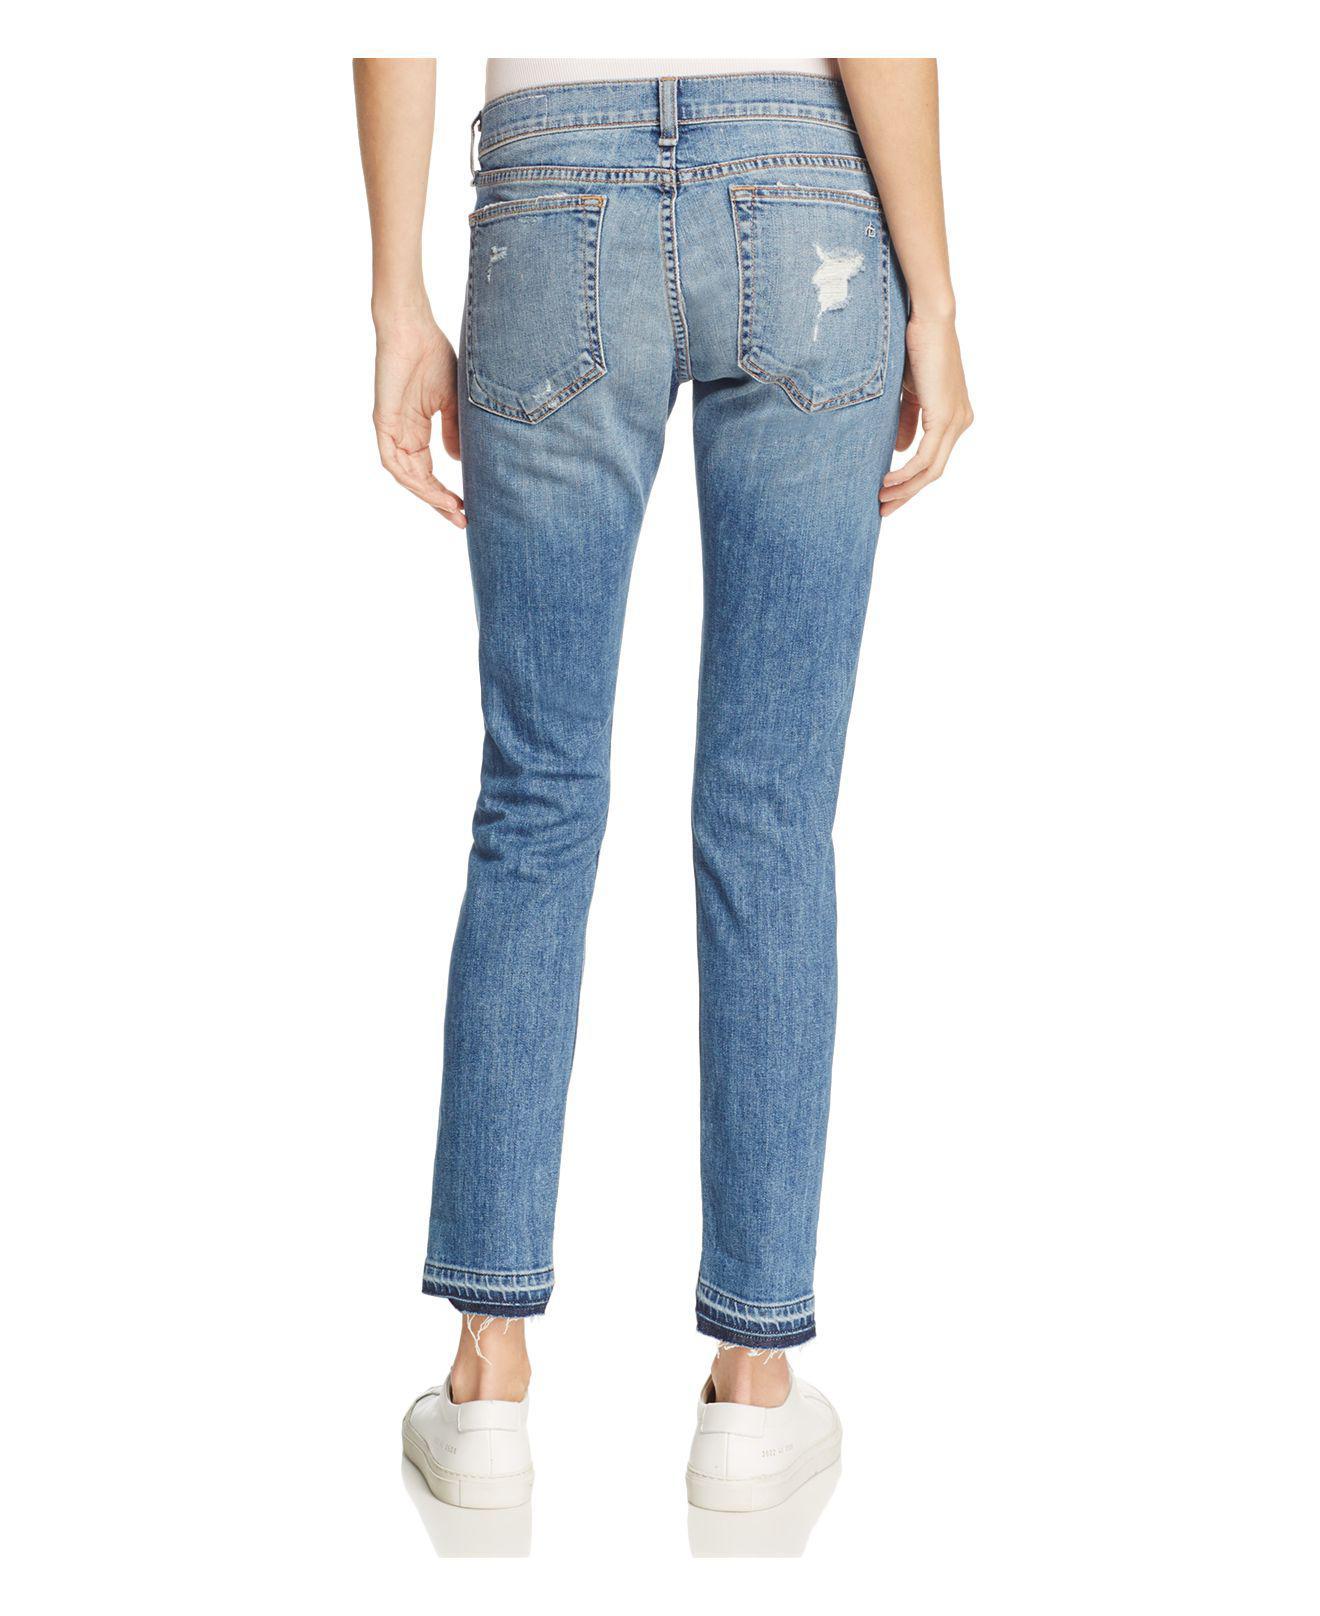 Rag & Bone Denim The Dre Slim Boyfriend Crop Jeans In Kennedy in Blue